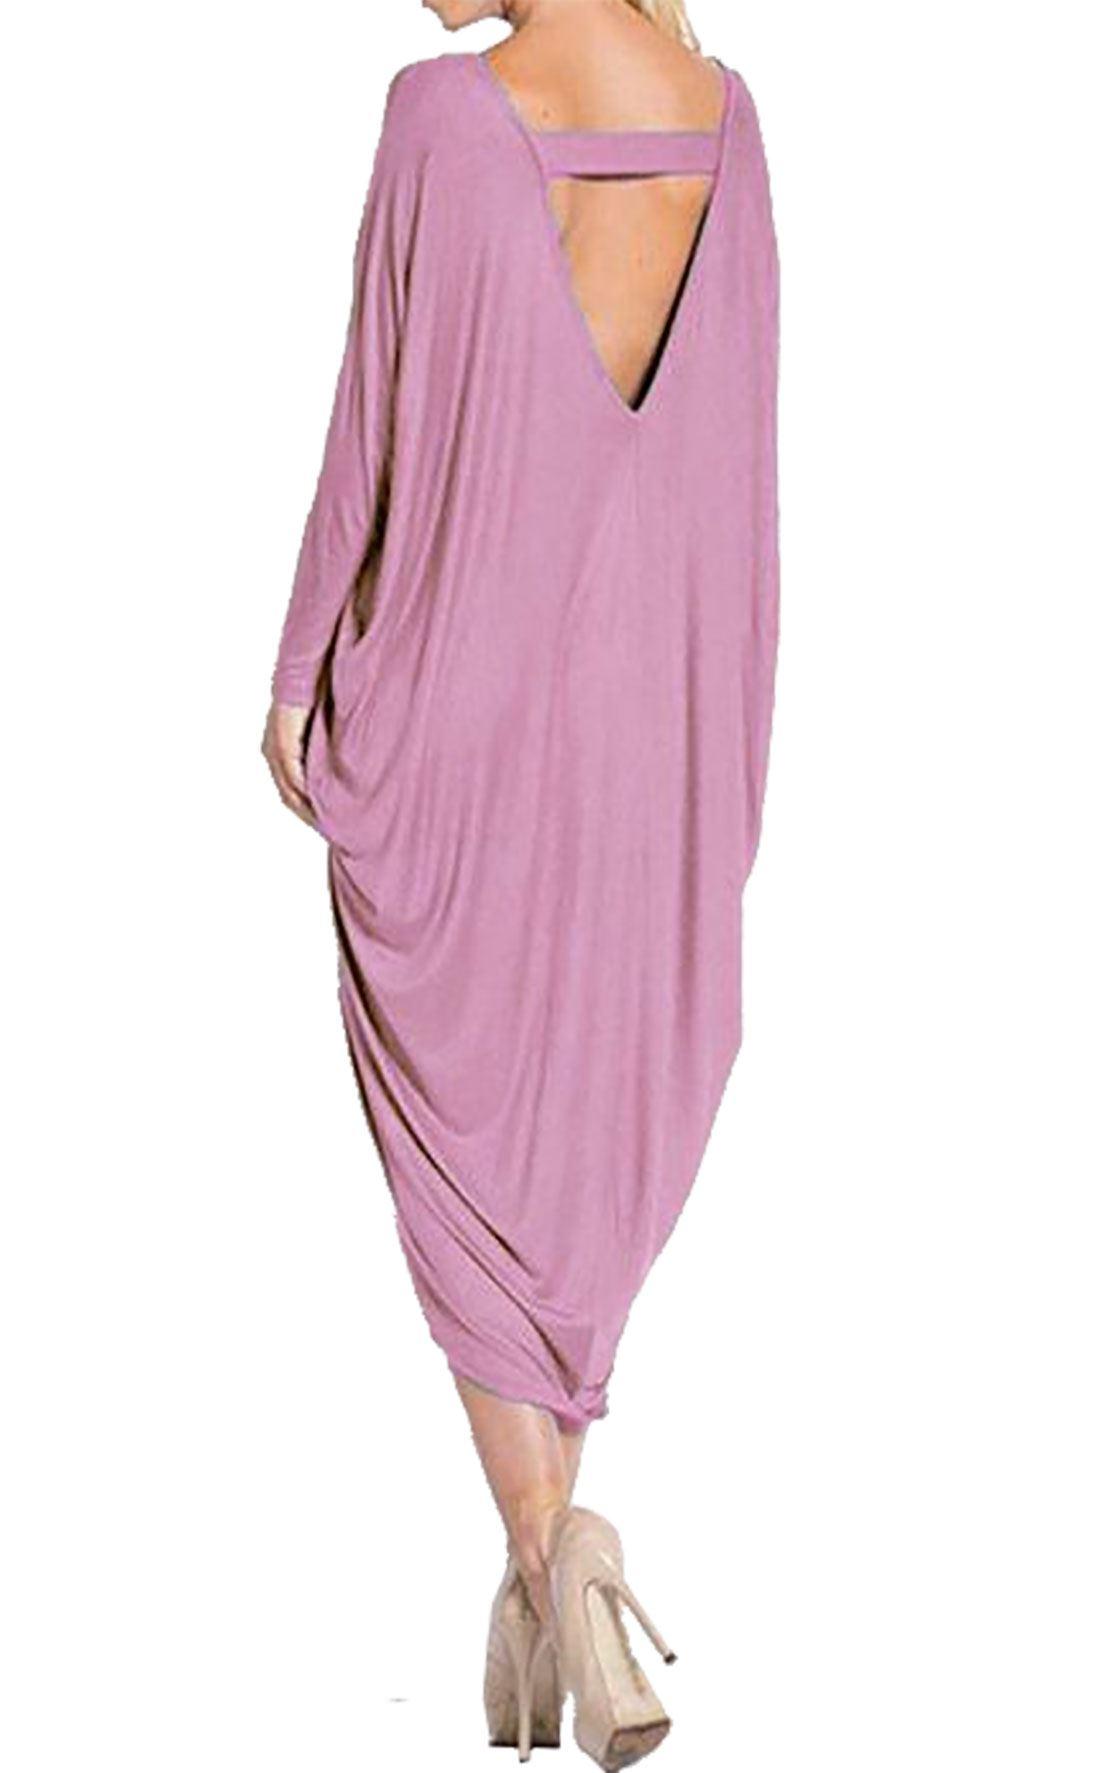 Womens Long Sleeve Backless Dress Ladies Cocktail Club Wear Baggy Midi Dress